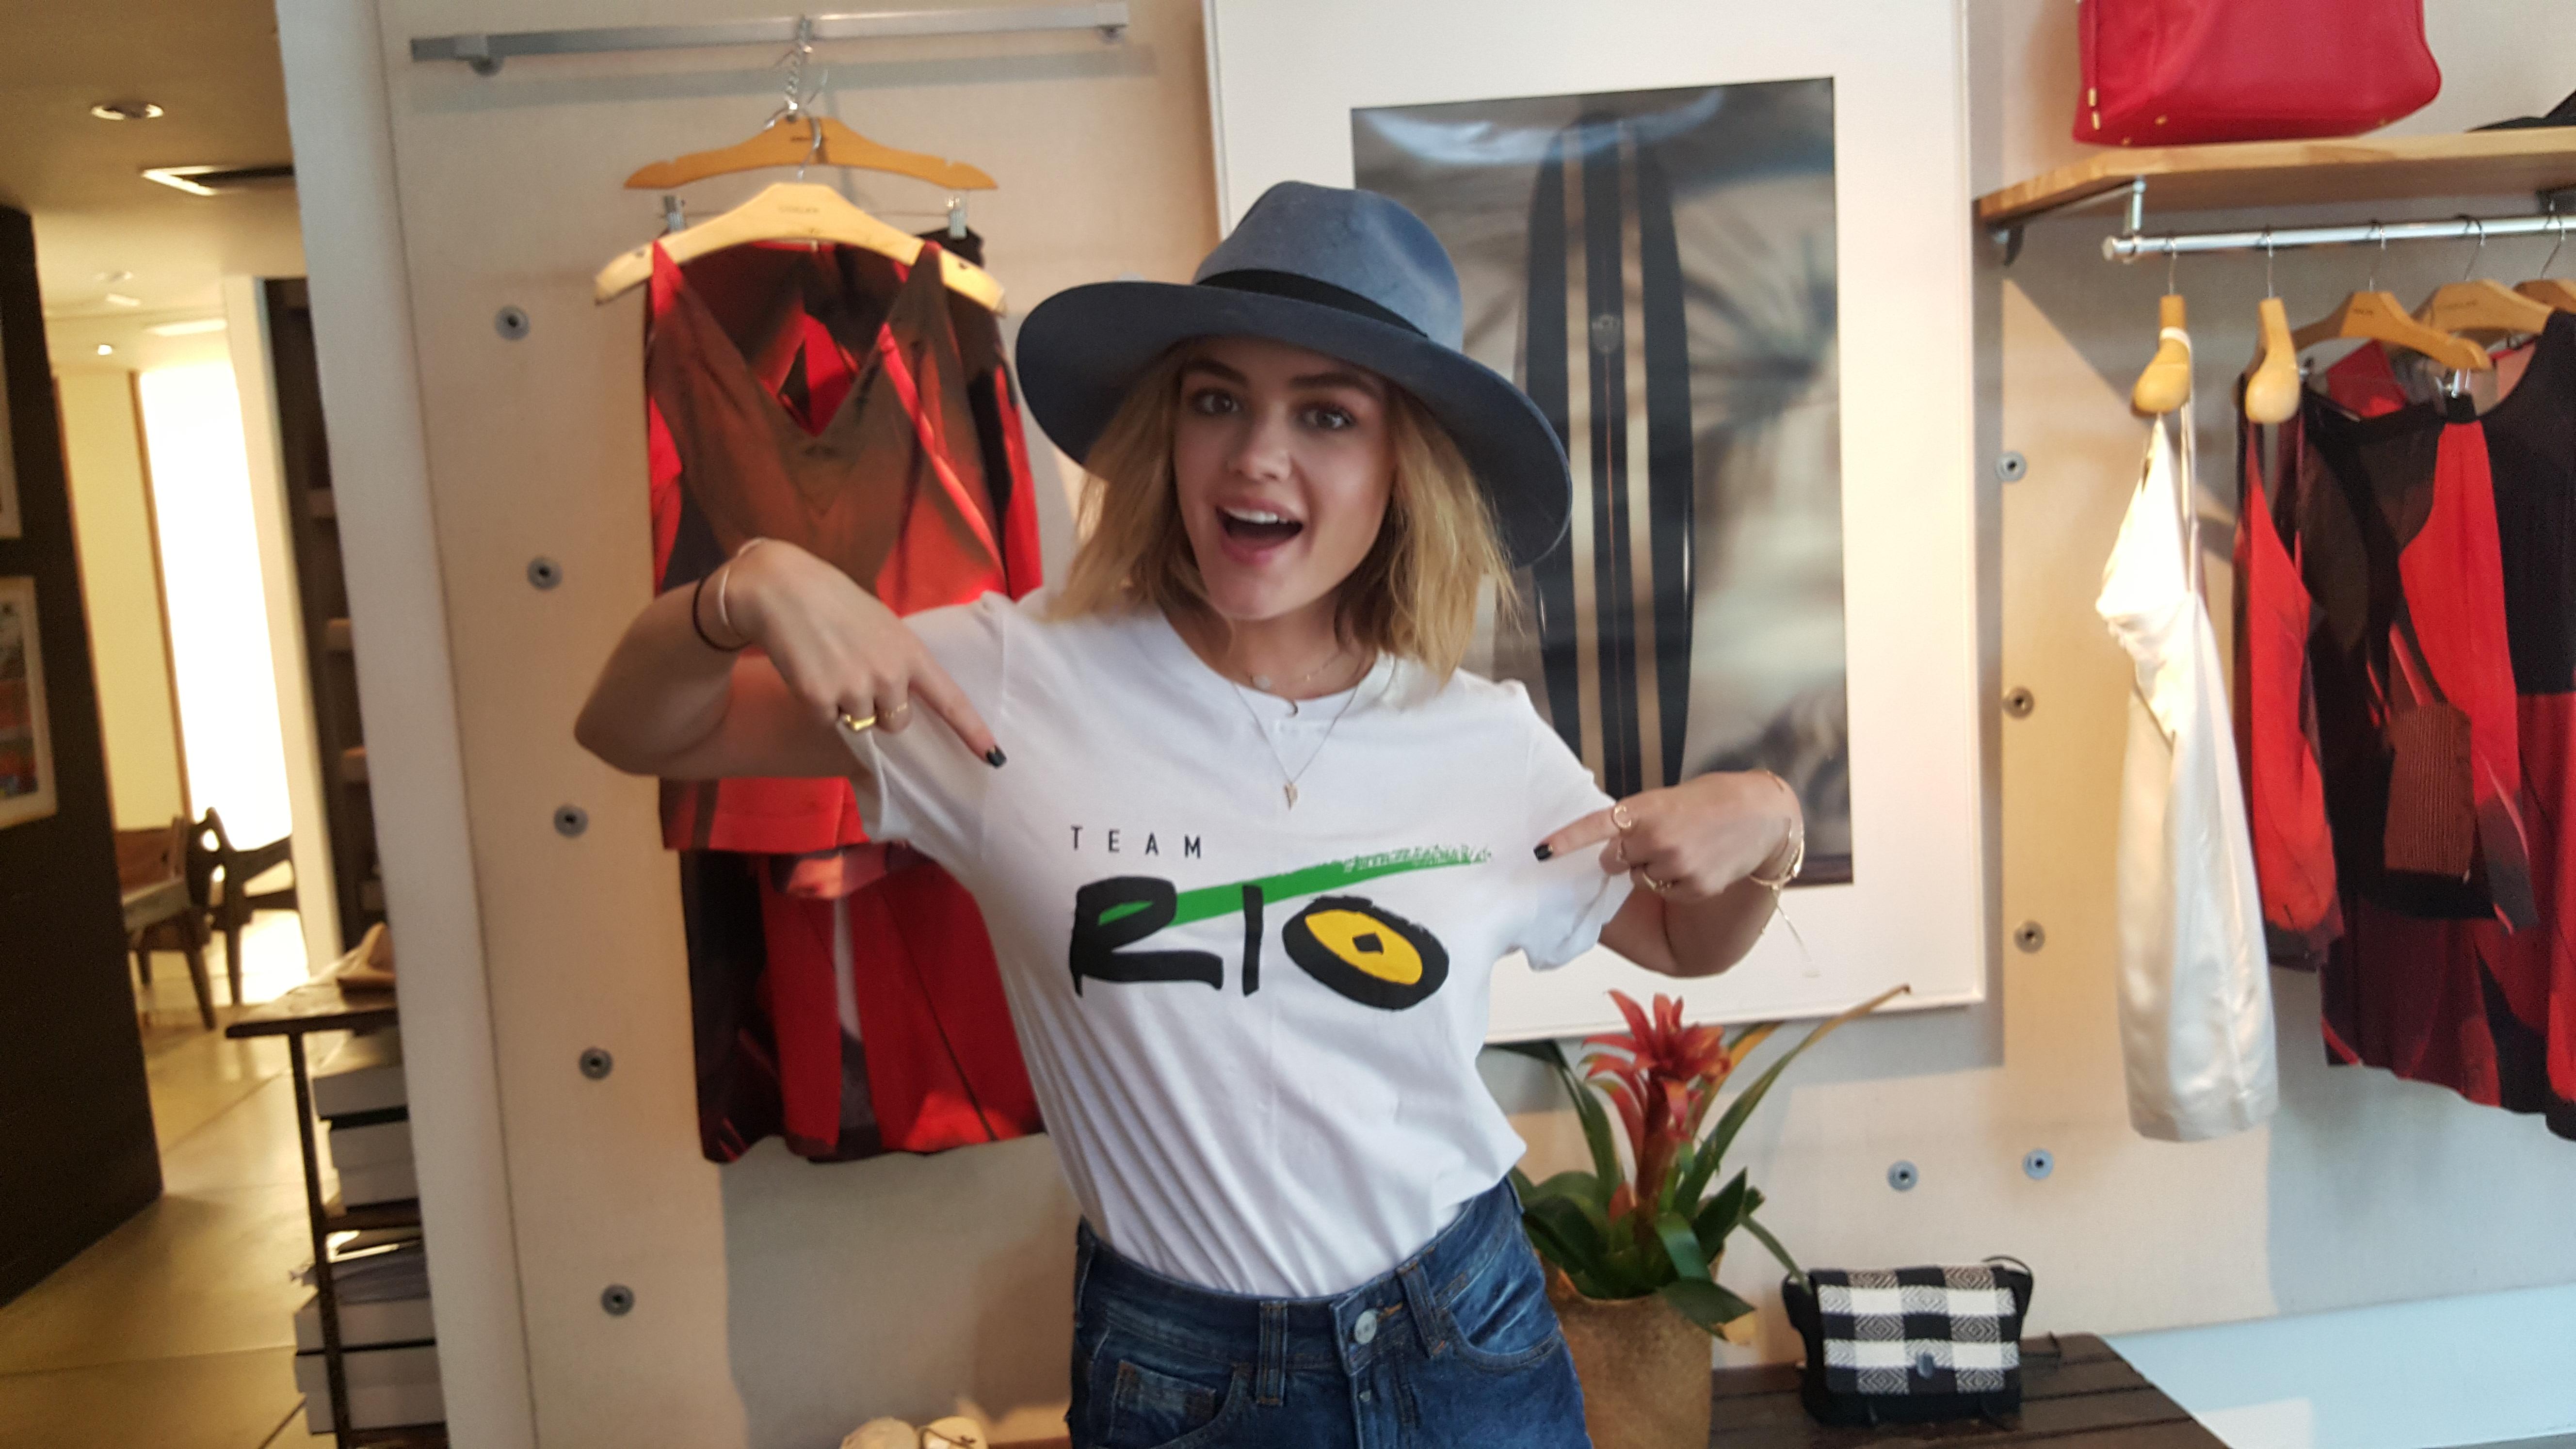 BrazilFoundation TeamRio Lucy Hale